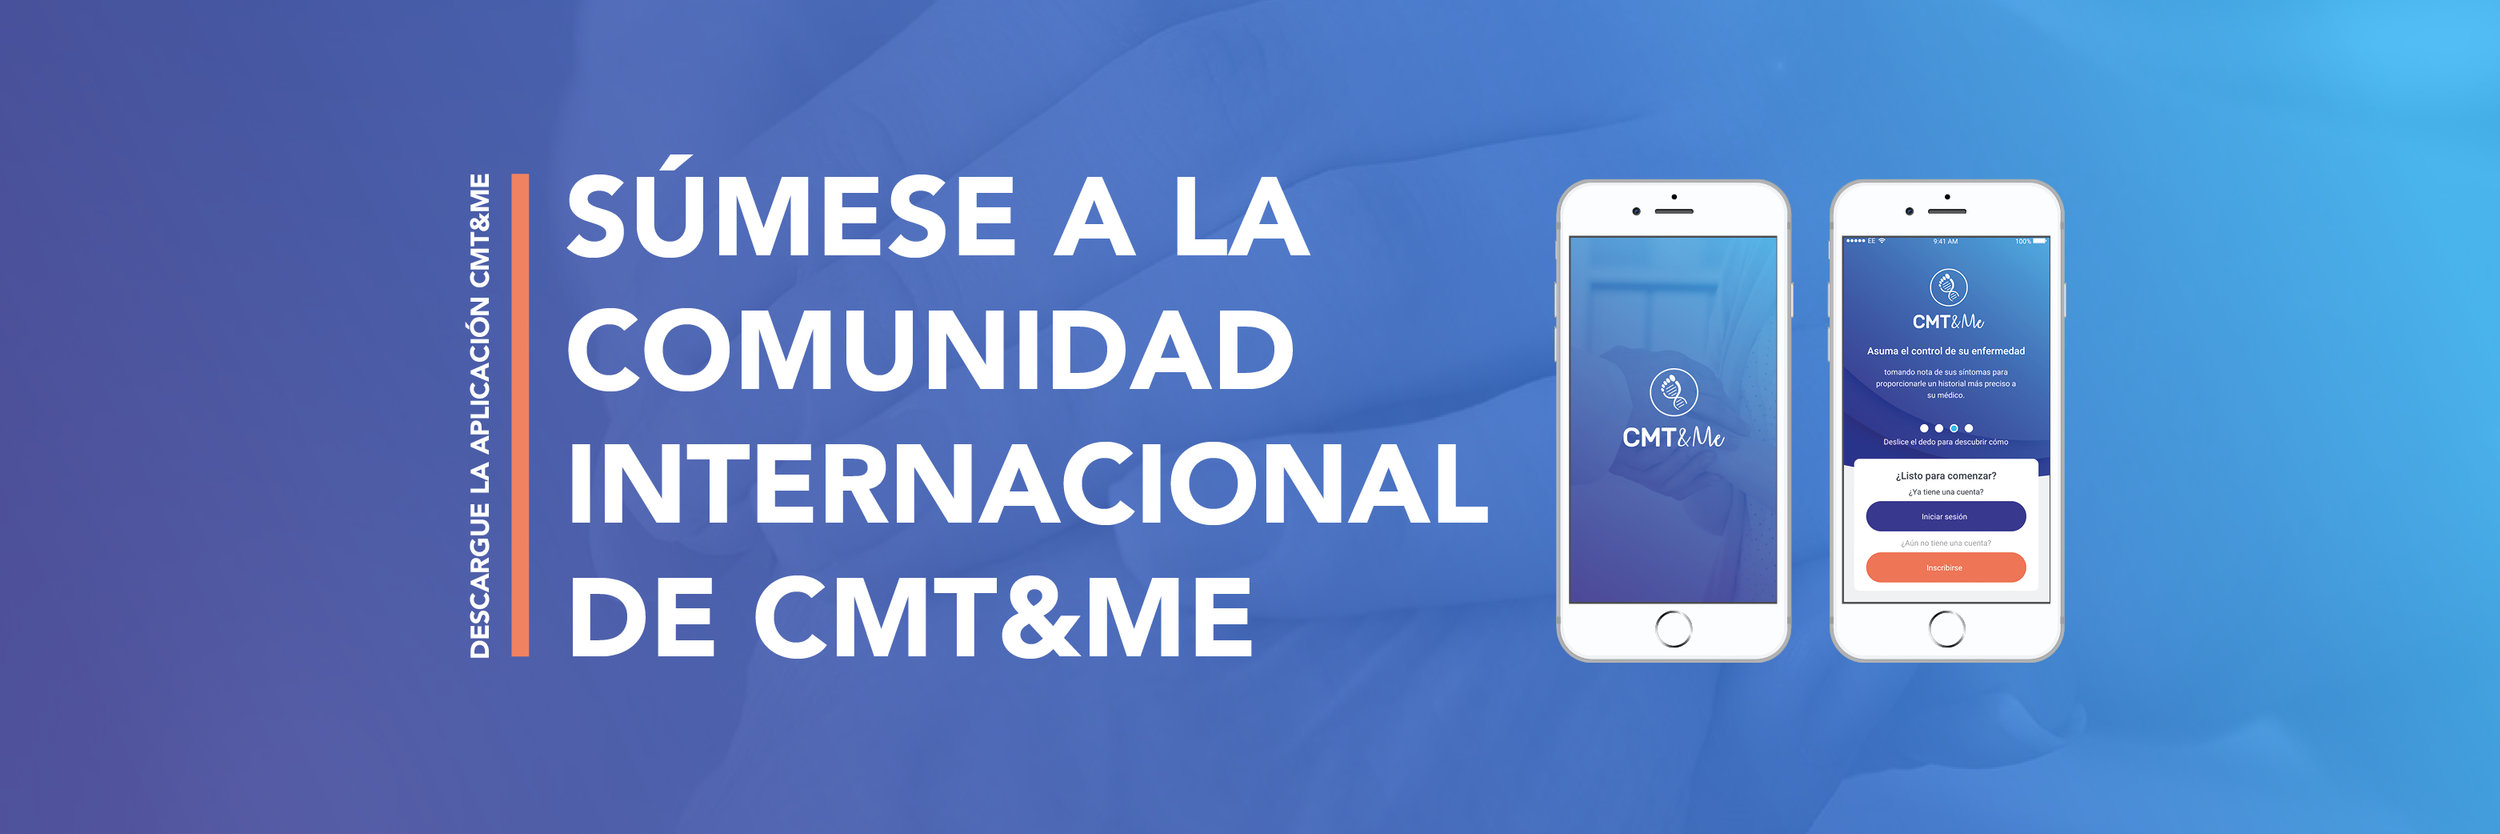 CMT&Me social header esUS 07Apr19 WEB.jpg